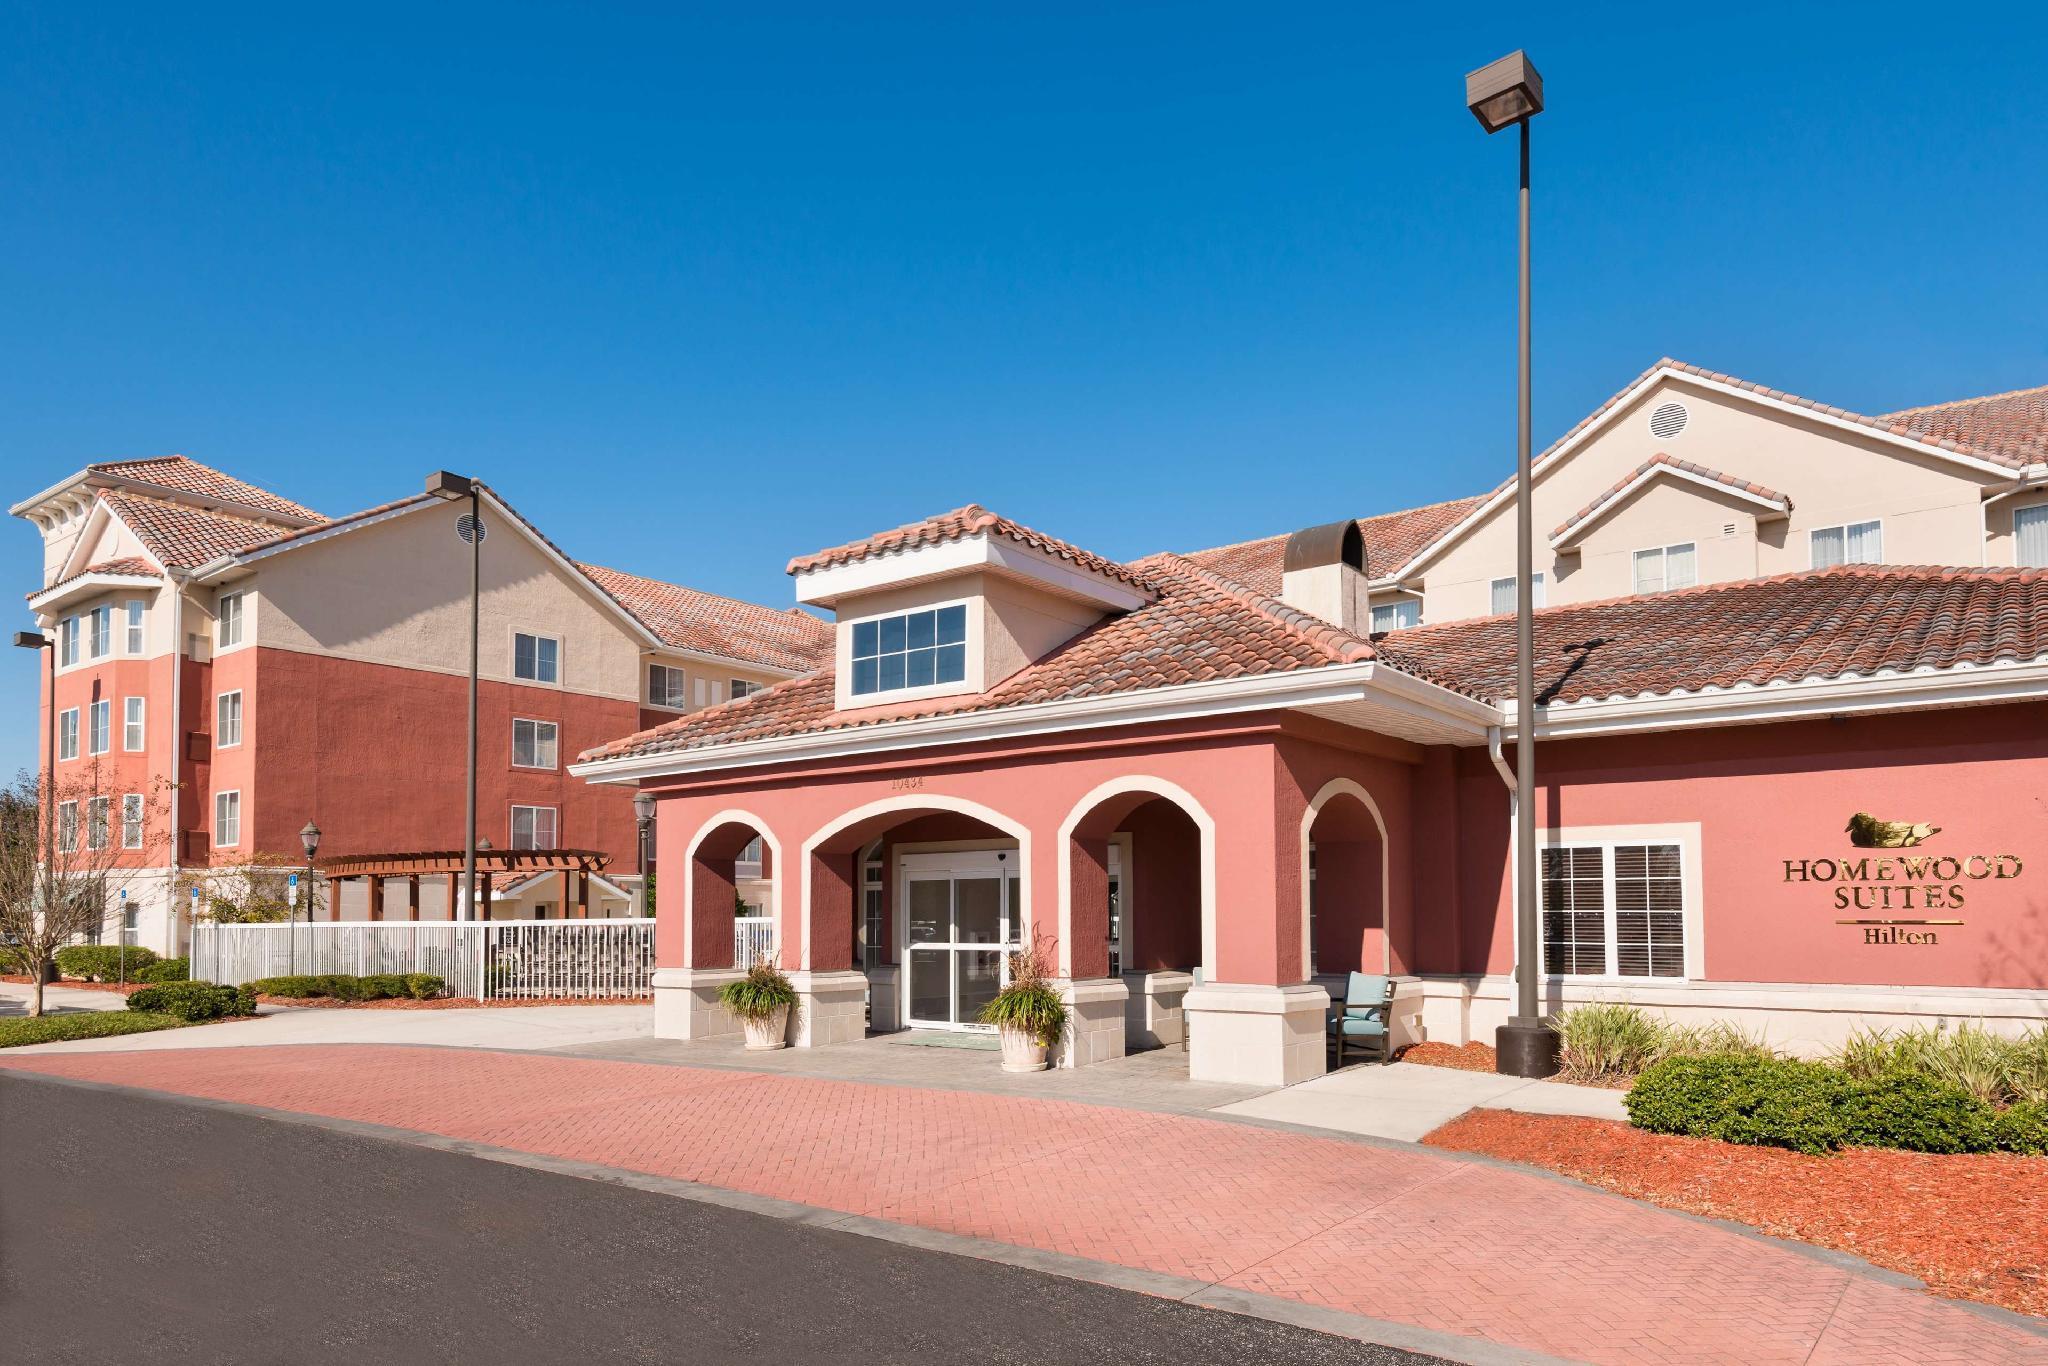 Homewood Suites By Hilton Jacksonville South St Johns Ctr